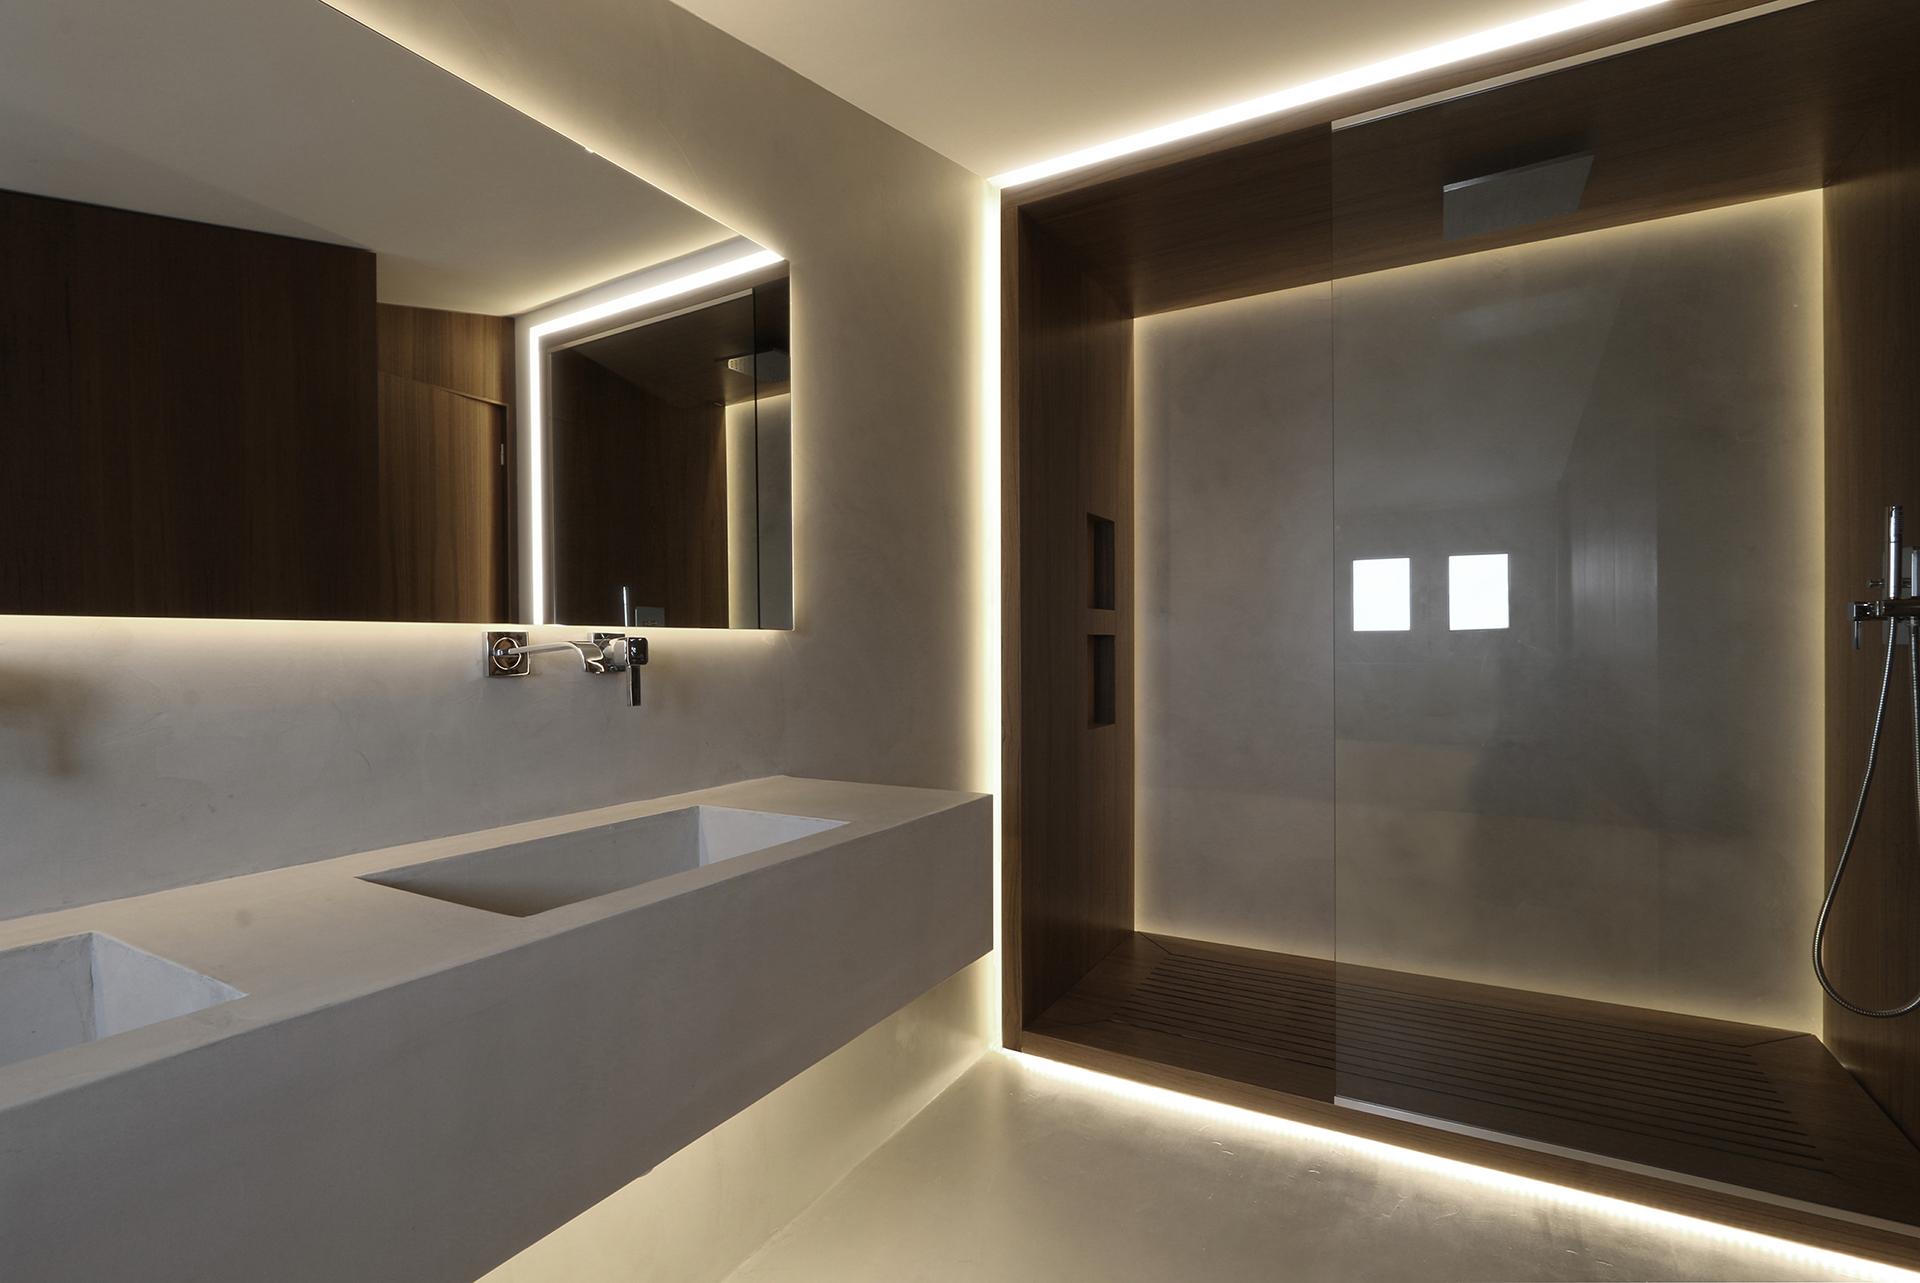 attic bathroom 03.jpg